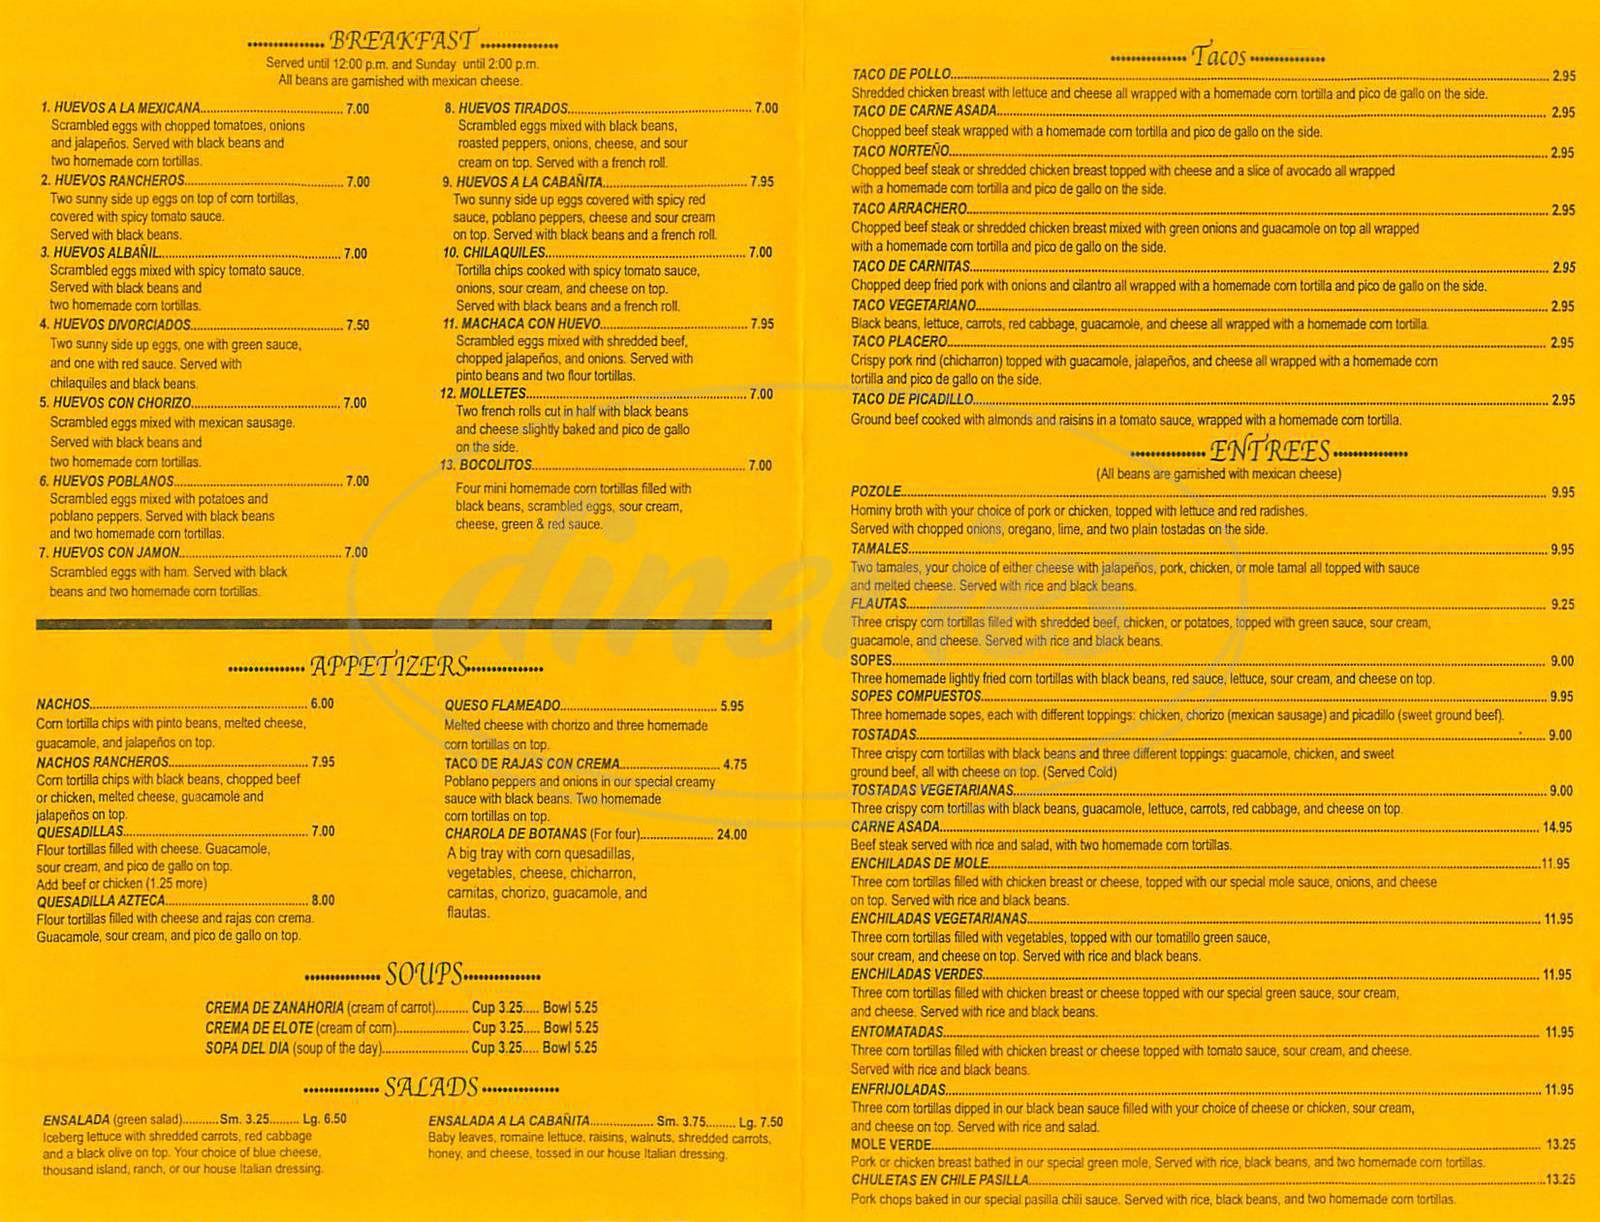 menu for La Cabanita